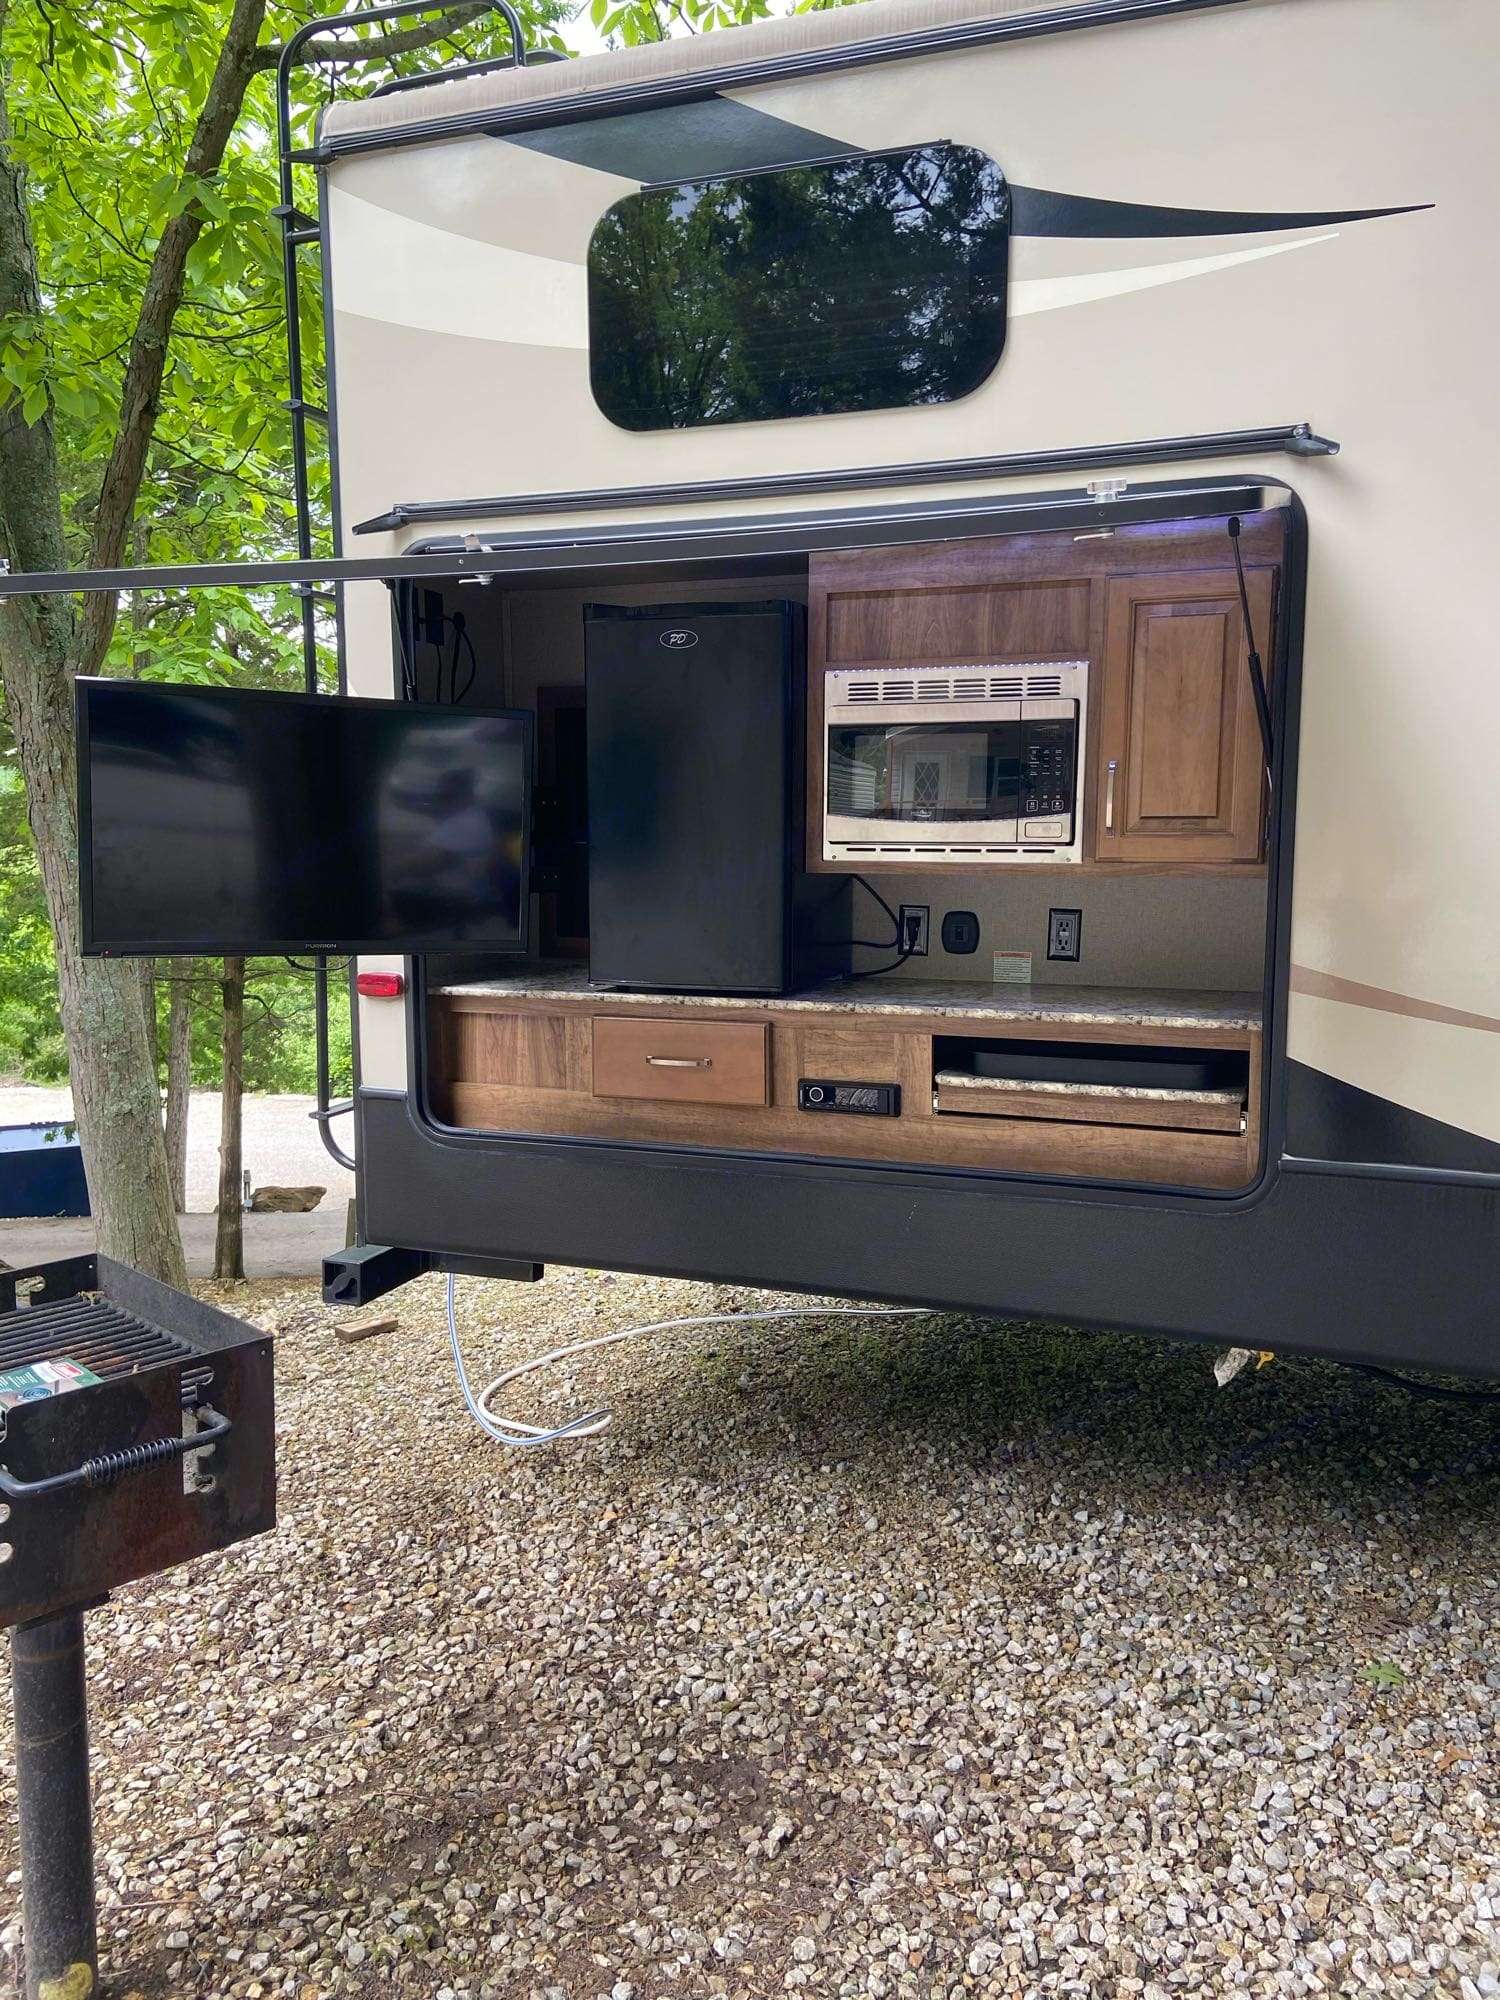 Outdoor kitchen with cooktop, TV/radio, microwave, refrigerator and storage. Keystone Laredo 2019